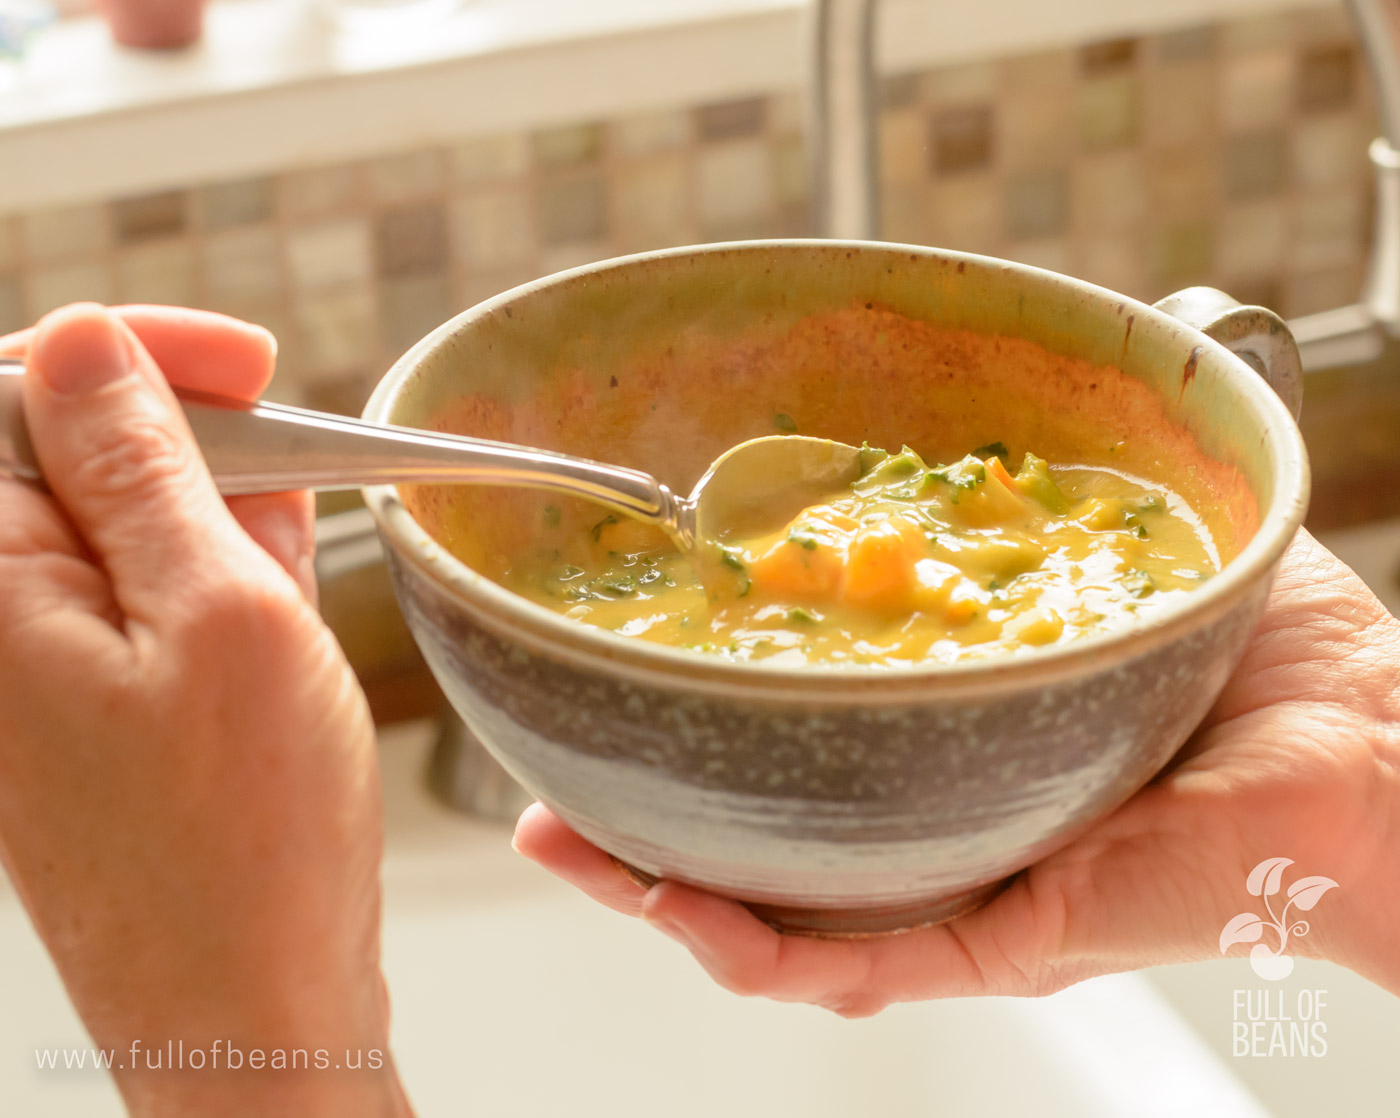 Vegan Corn Chowder With Sweet Potatoes